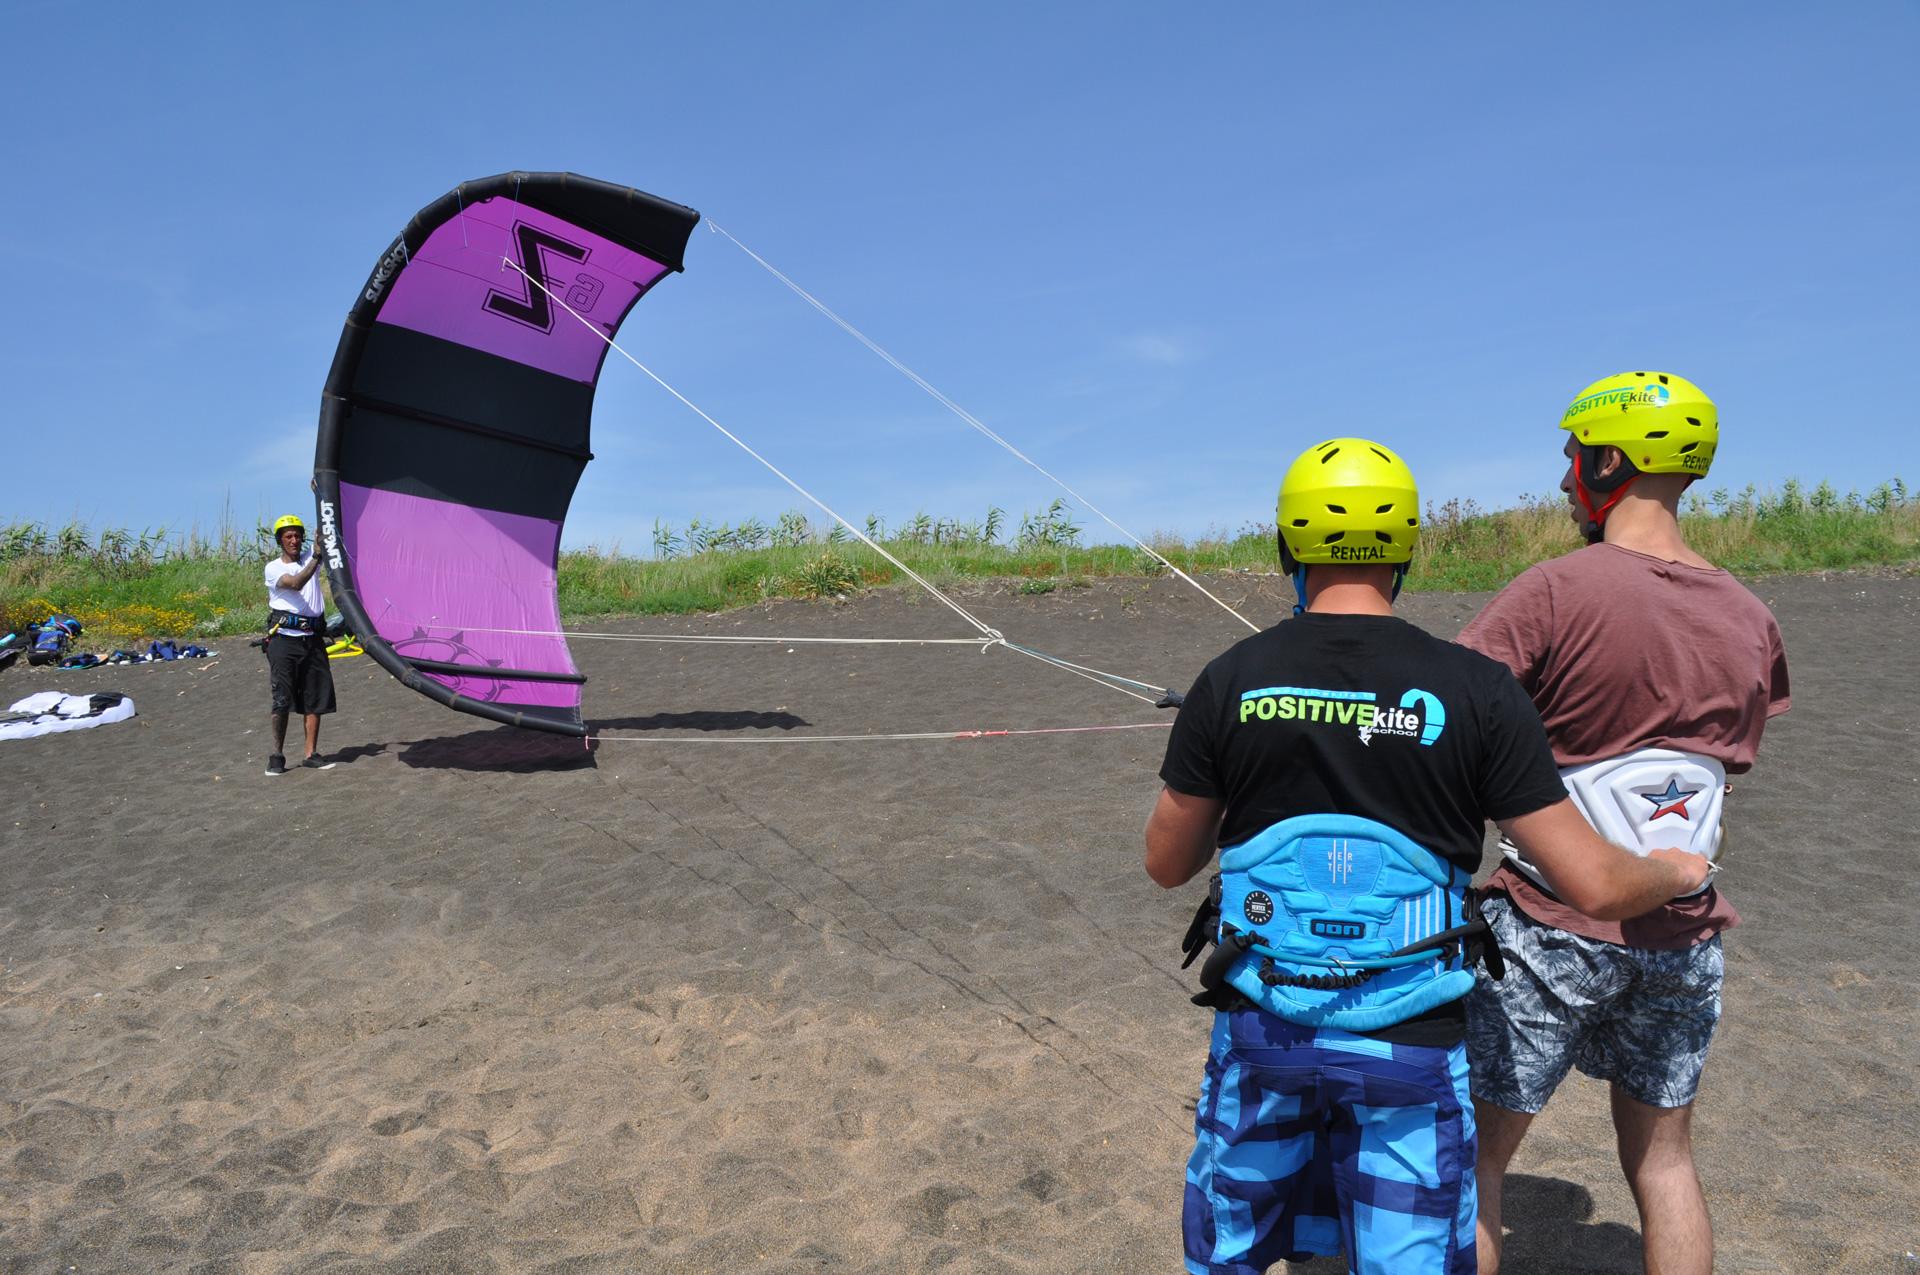 corso lezione kitesurf